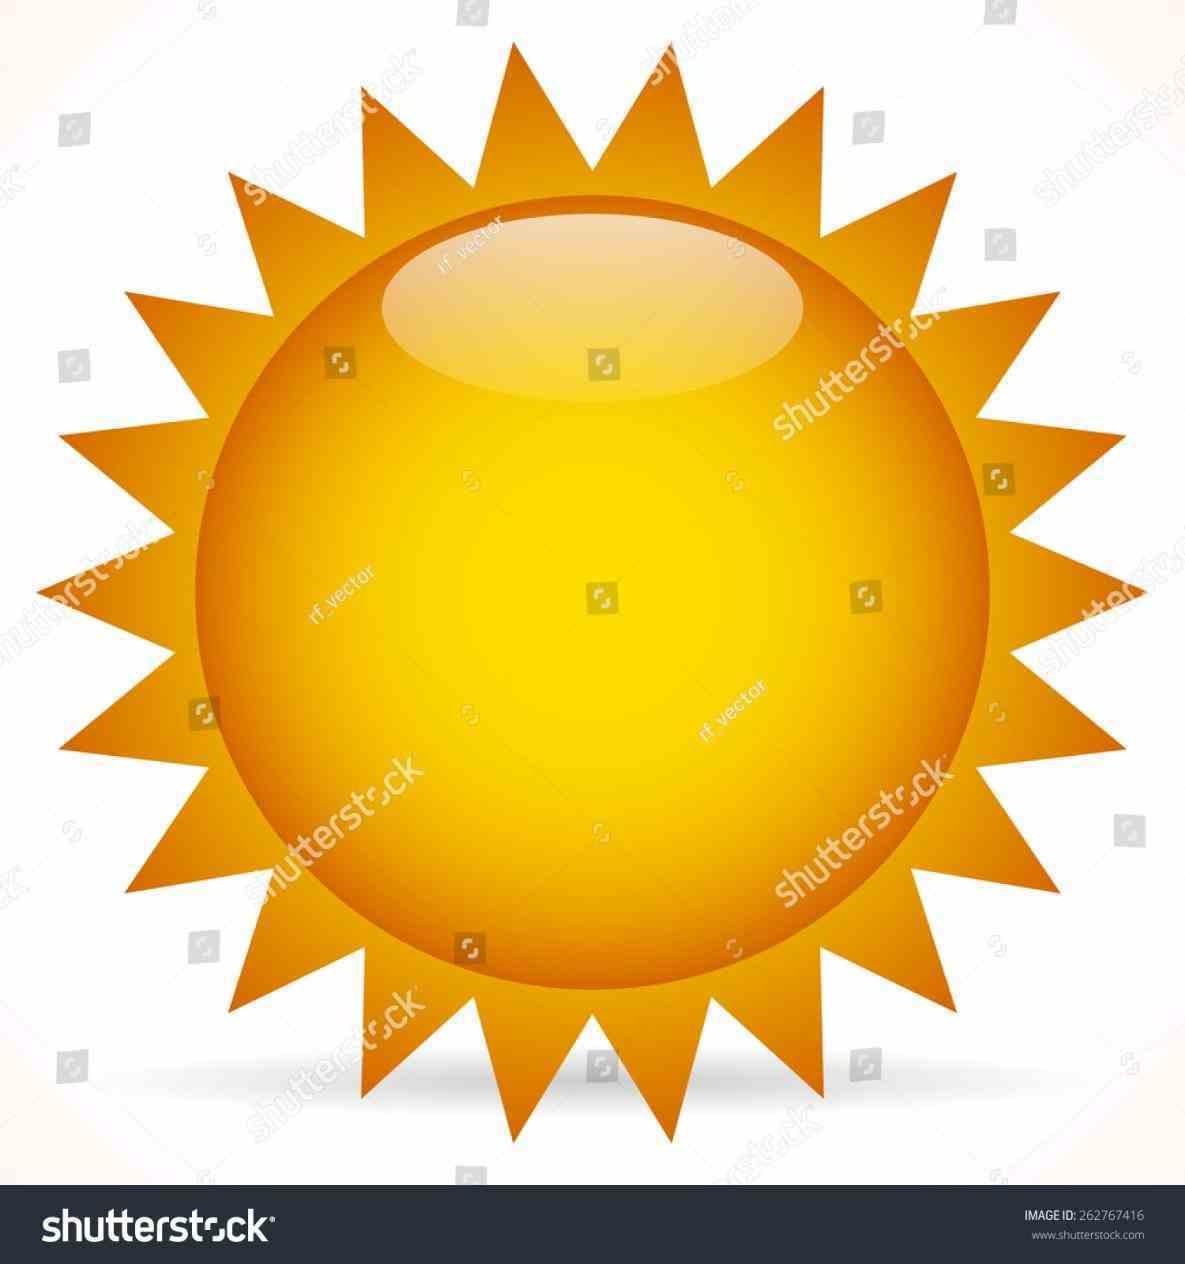 1185x1264 Rhcom Simple Inspirational Sunshine Free Clipart